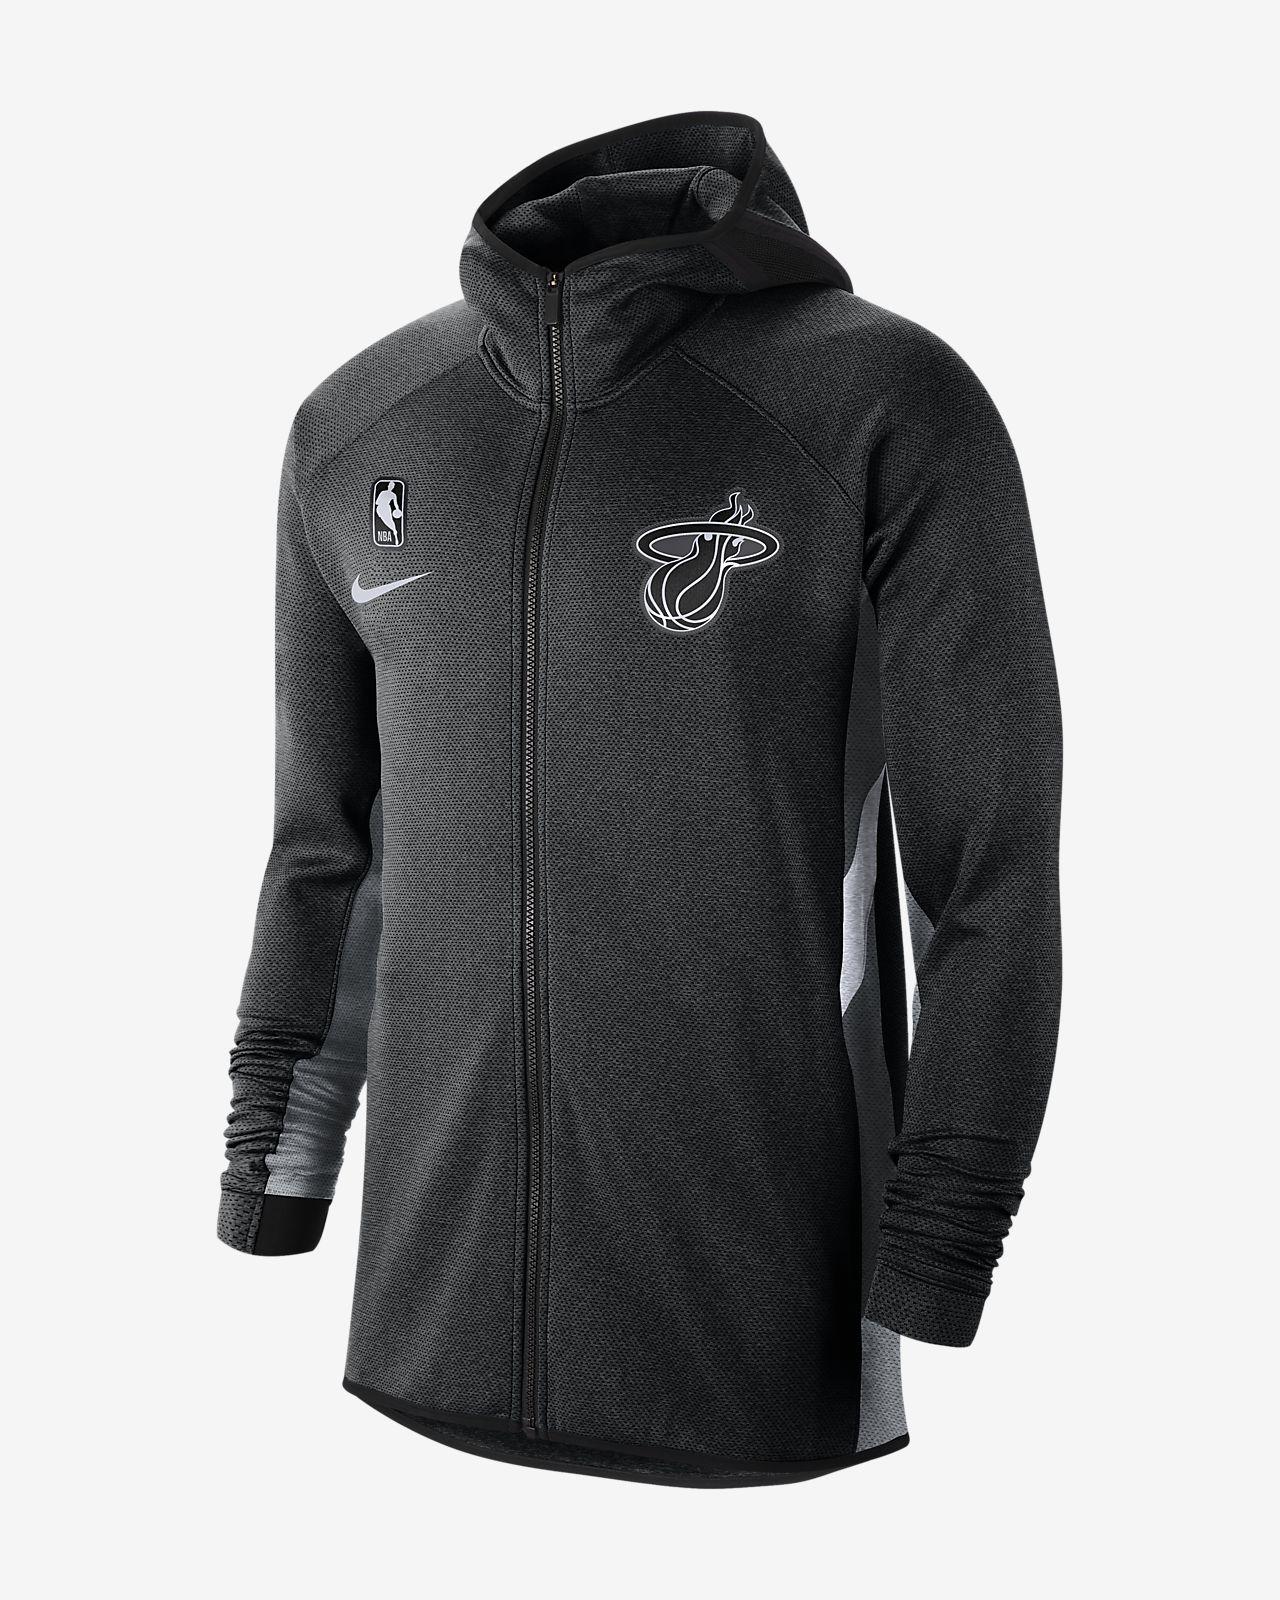 Miami Heat Nike Therma Flex Showtime Men's NBA Hoodie